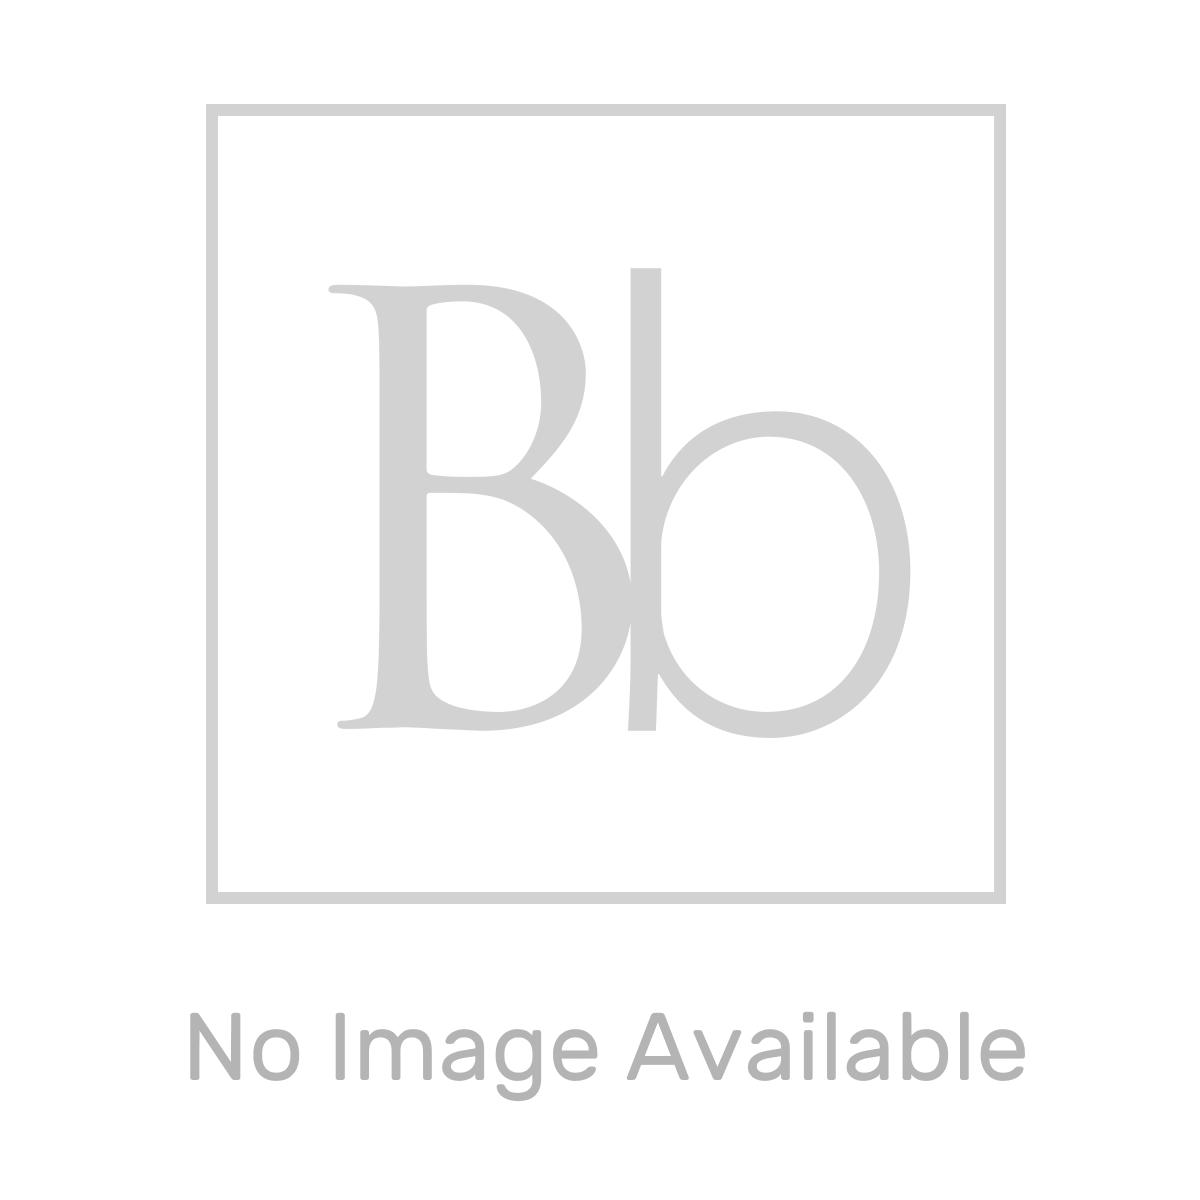 RAK Resort Maxi Close Coupled Toilet with Sandwich Soft Close Seat